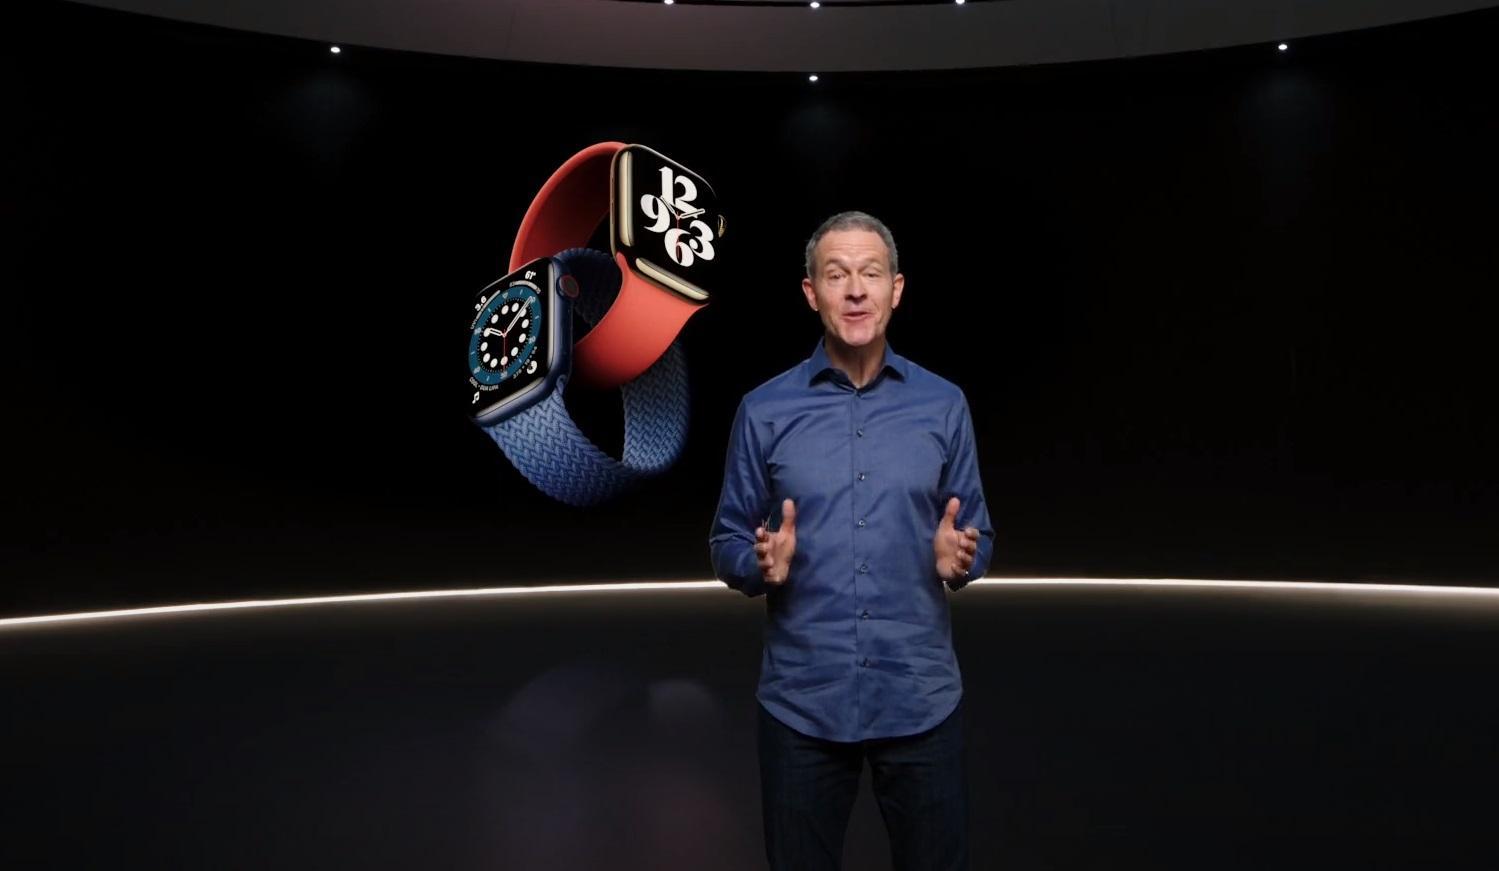 Презентация Apple Все Новинки: Apple Watch Series 6, Apple Watch SE, iPad Air, iPad